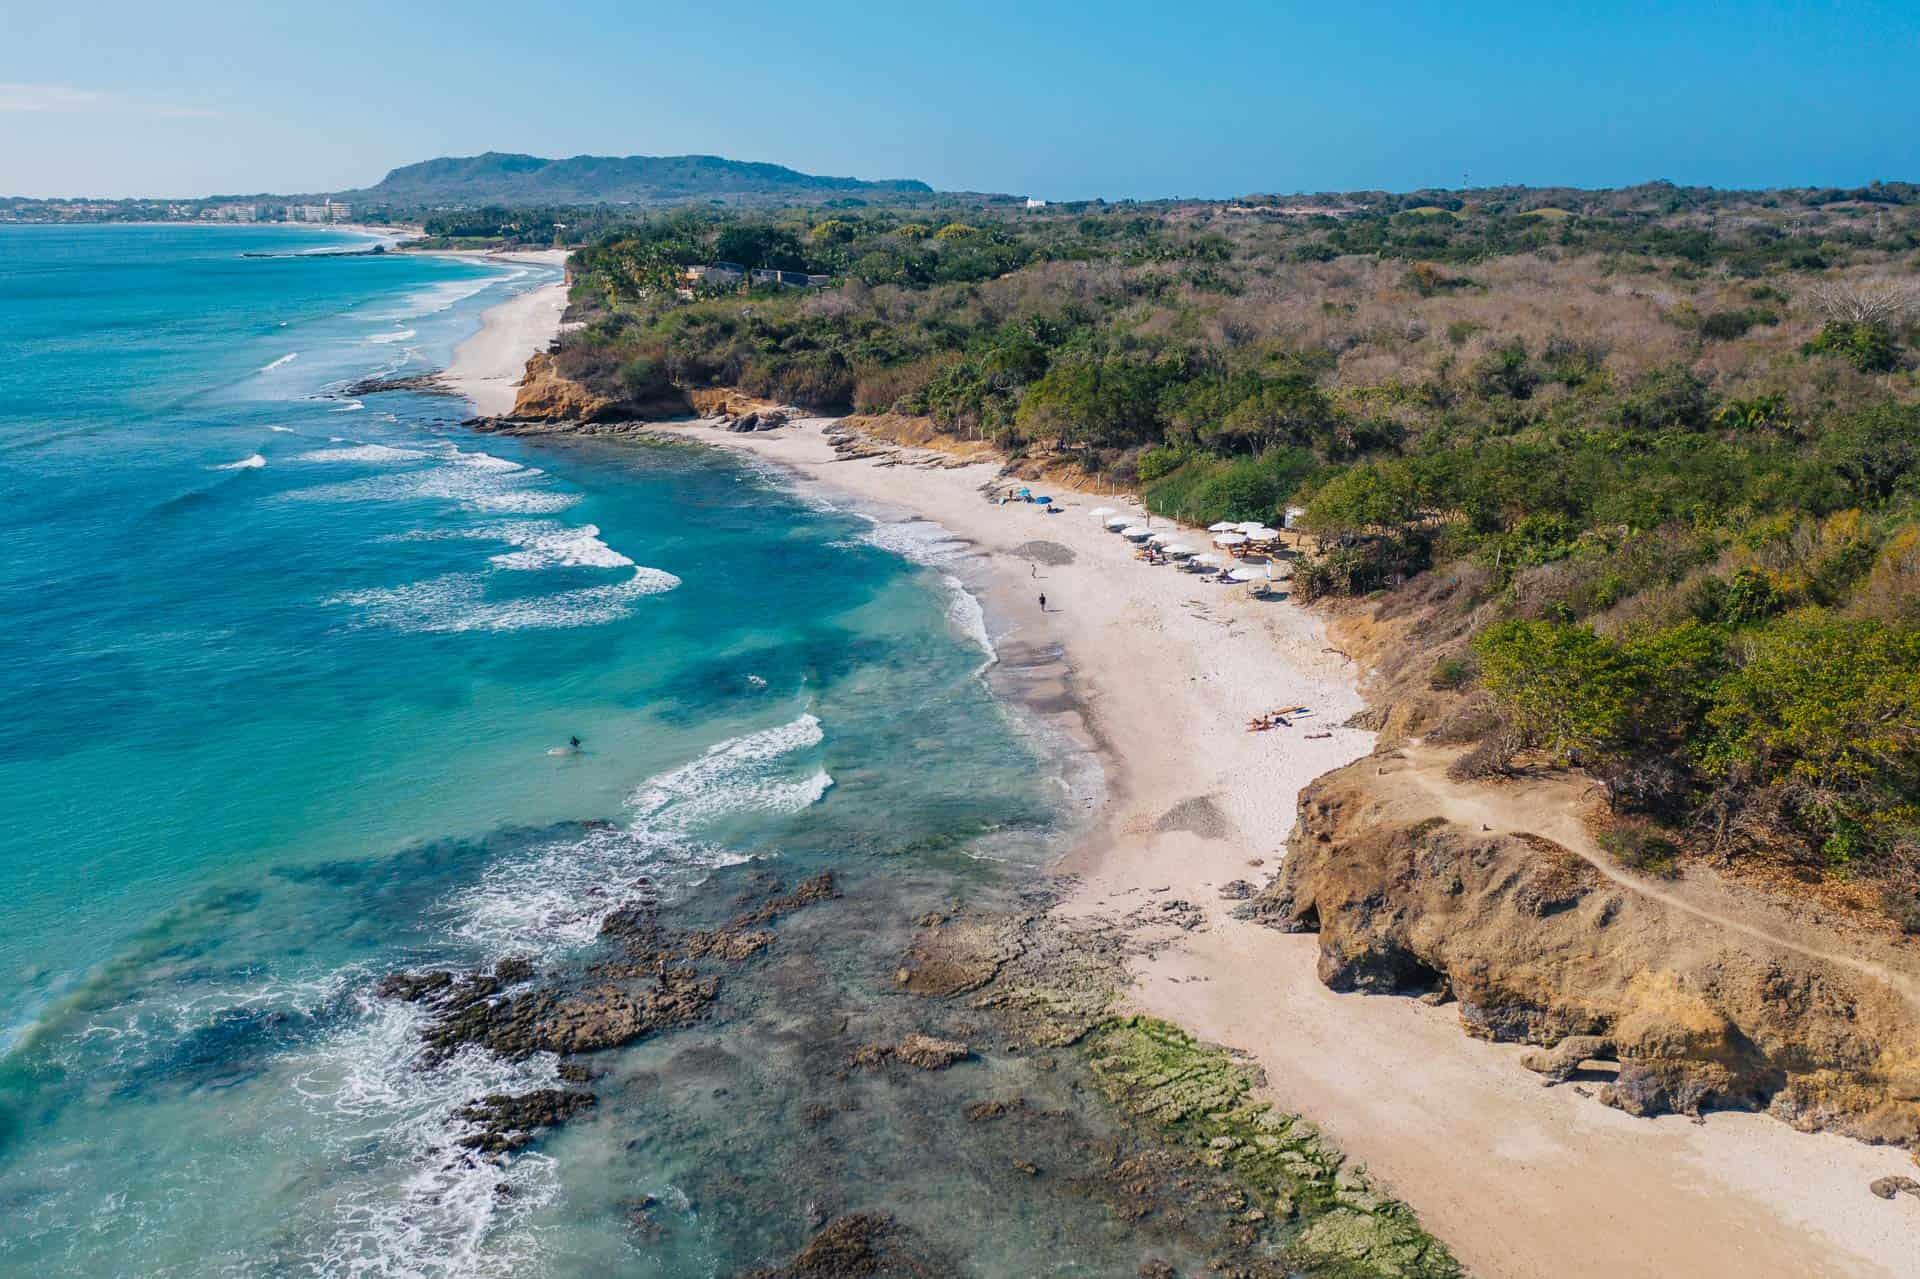 playa la lancha, things to do in sayulita, sayulita mexico, what to do in sayulita, sayulita